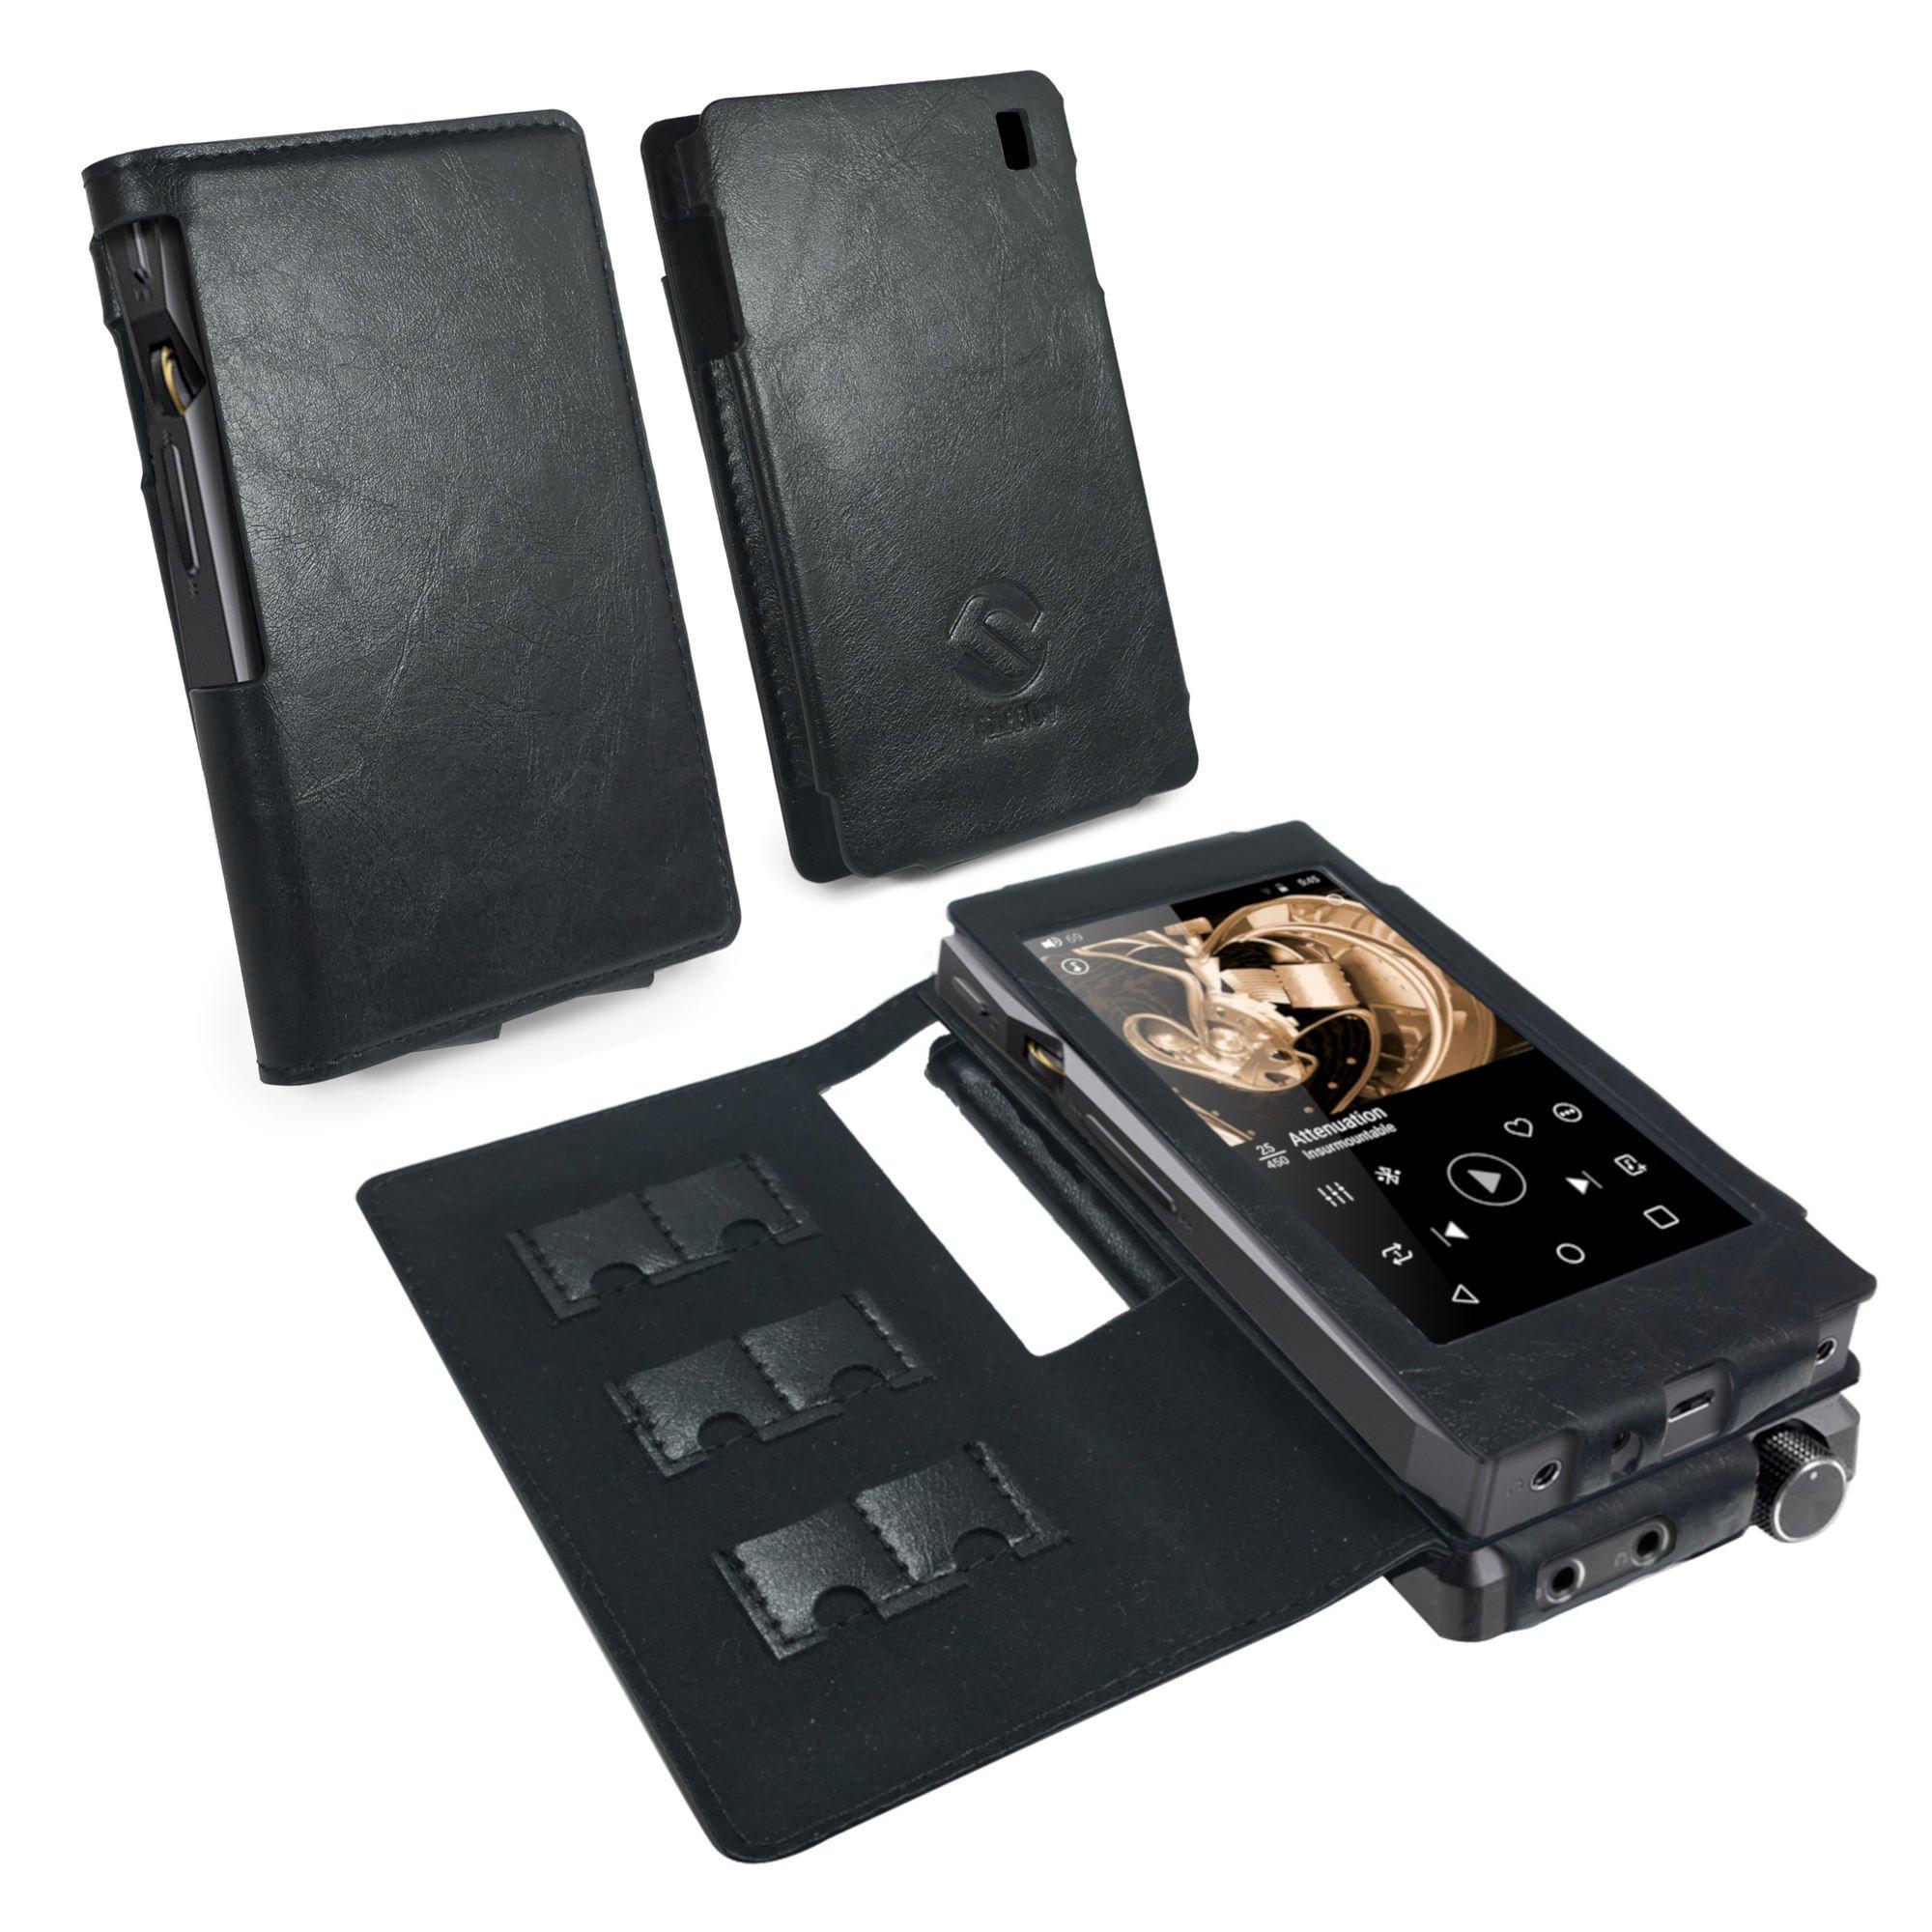 Tuff Luv Faux Leather Case Cover for FiiO X5 iii 3rd Gen & A5 / E12 Amp (V1.2) - MP3 - Black